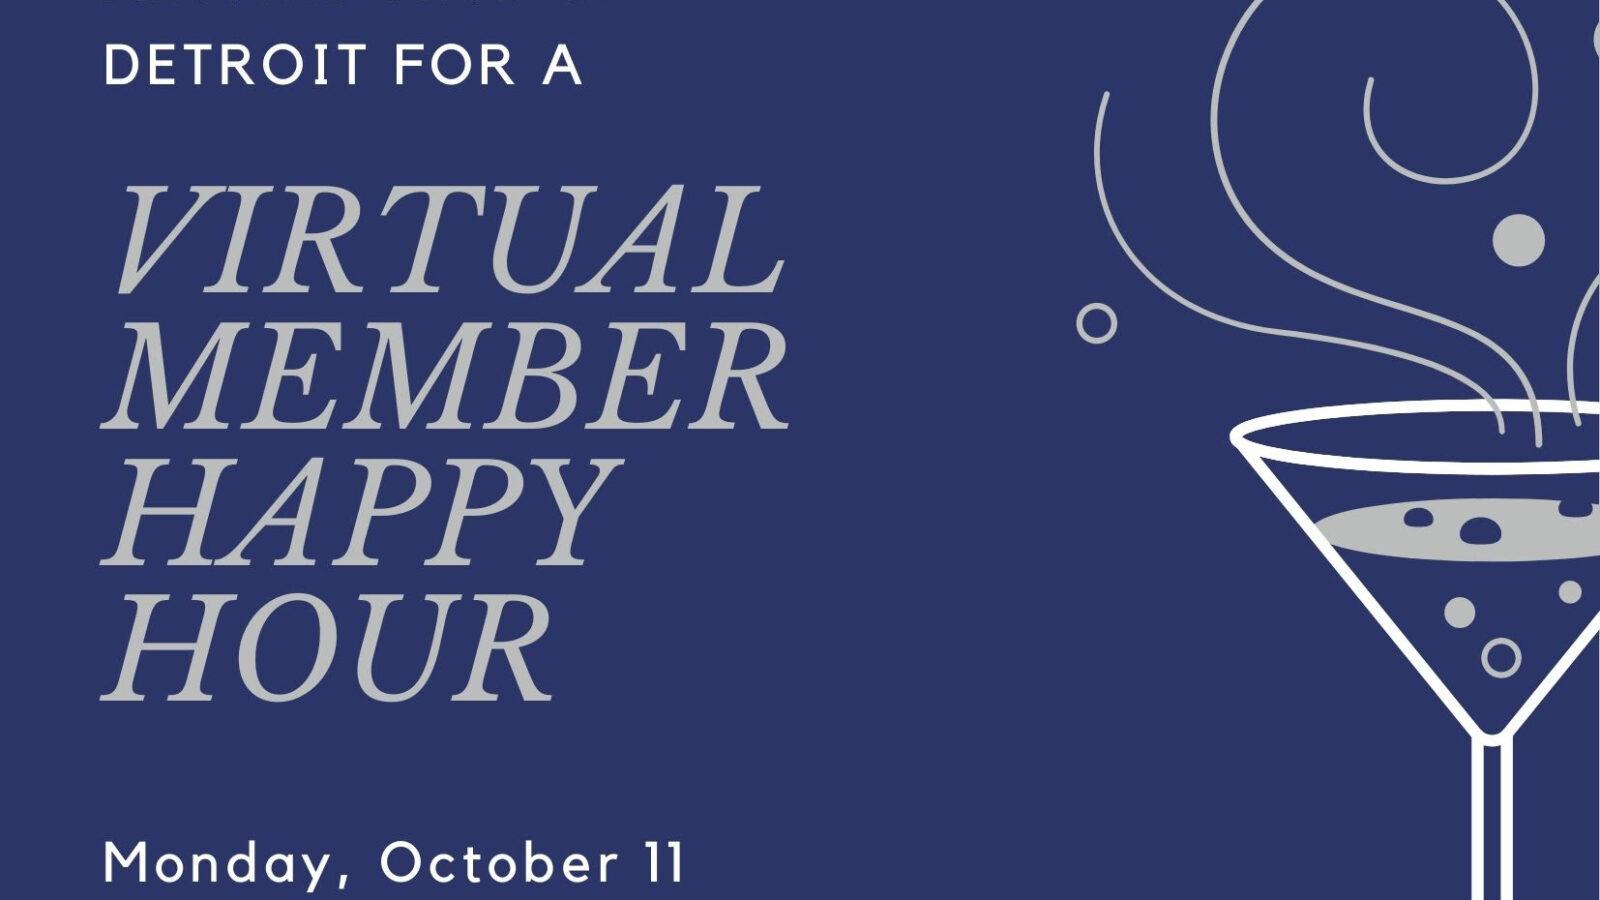 Virtual Member Happy Hour Invitation